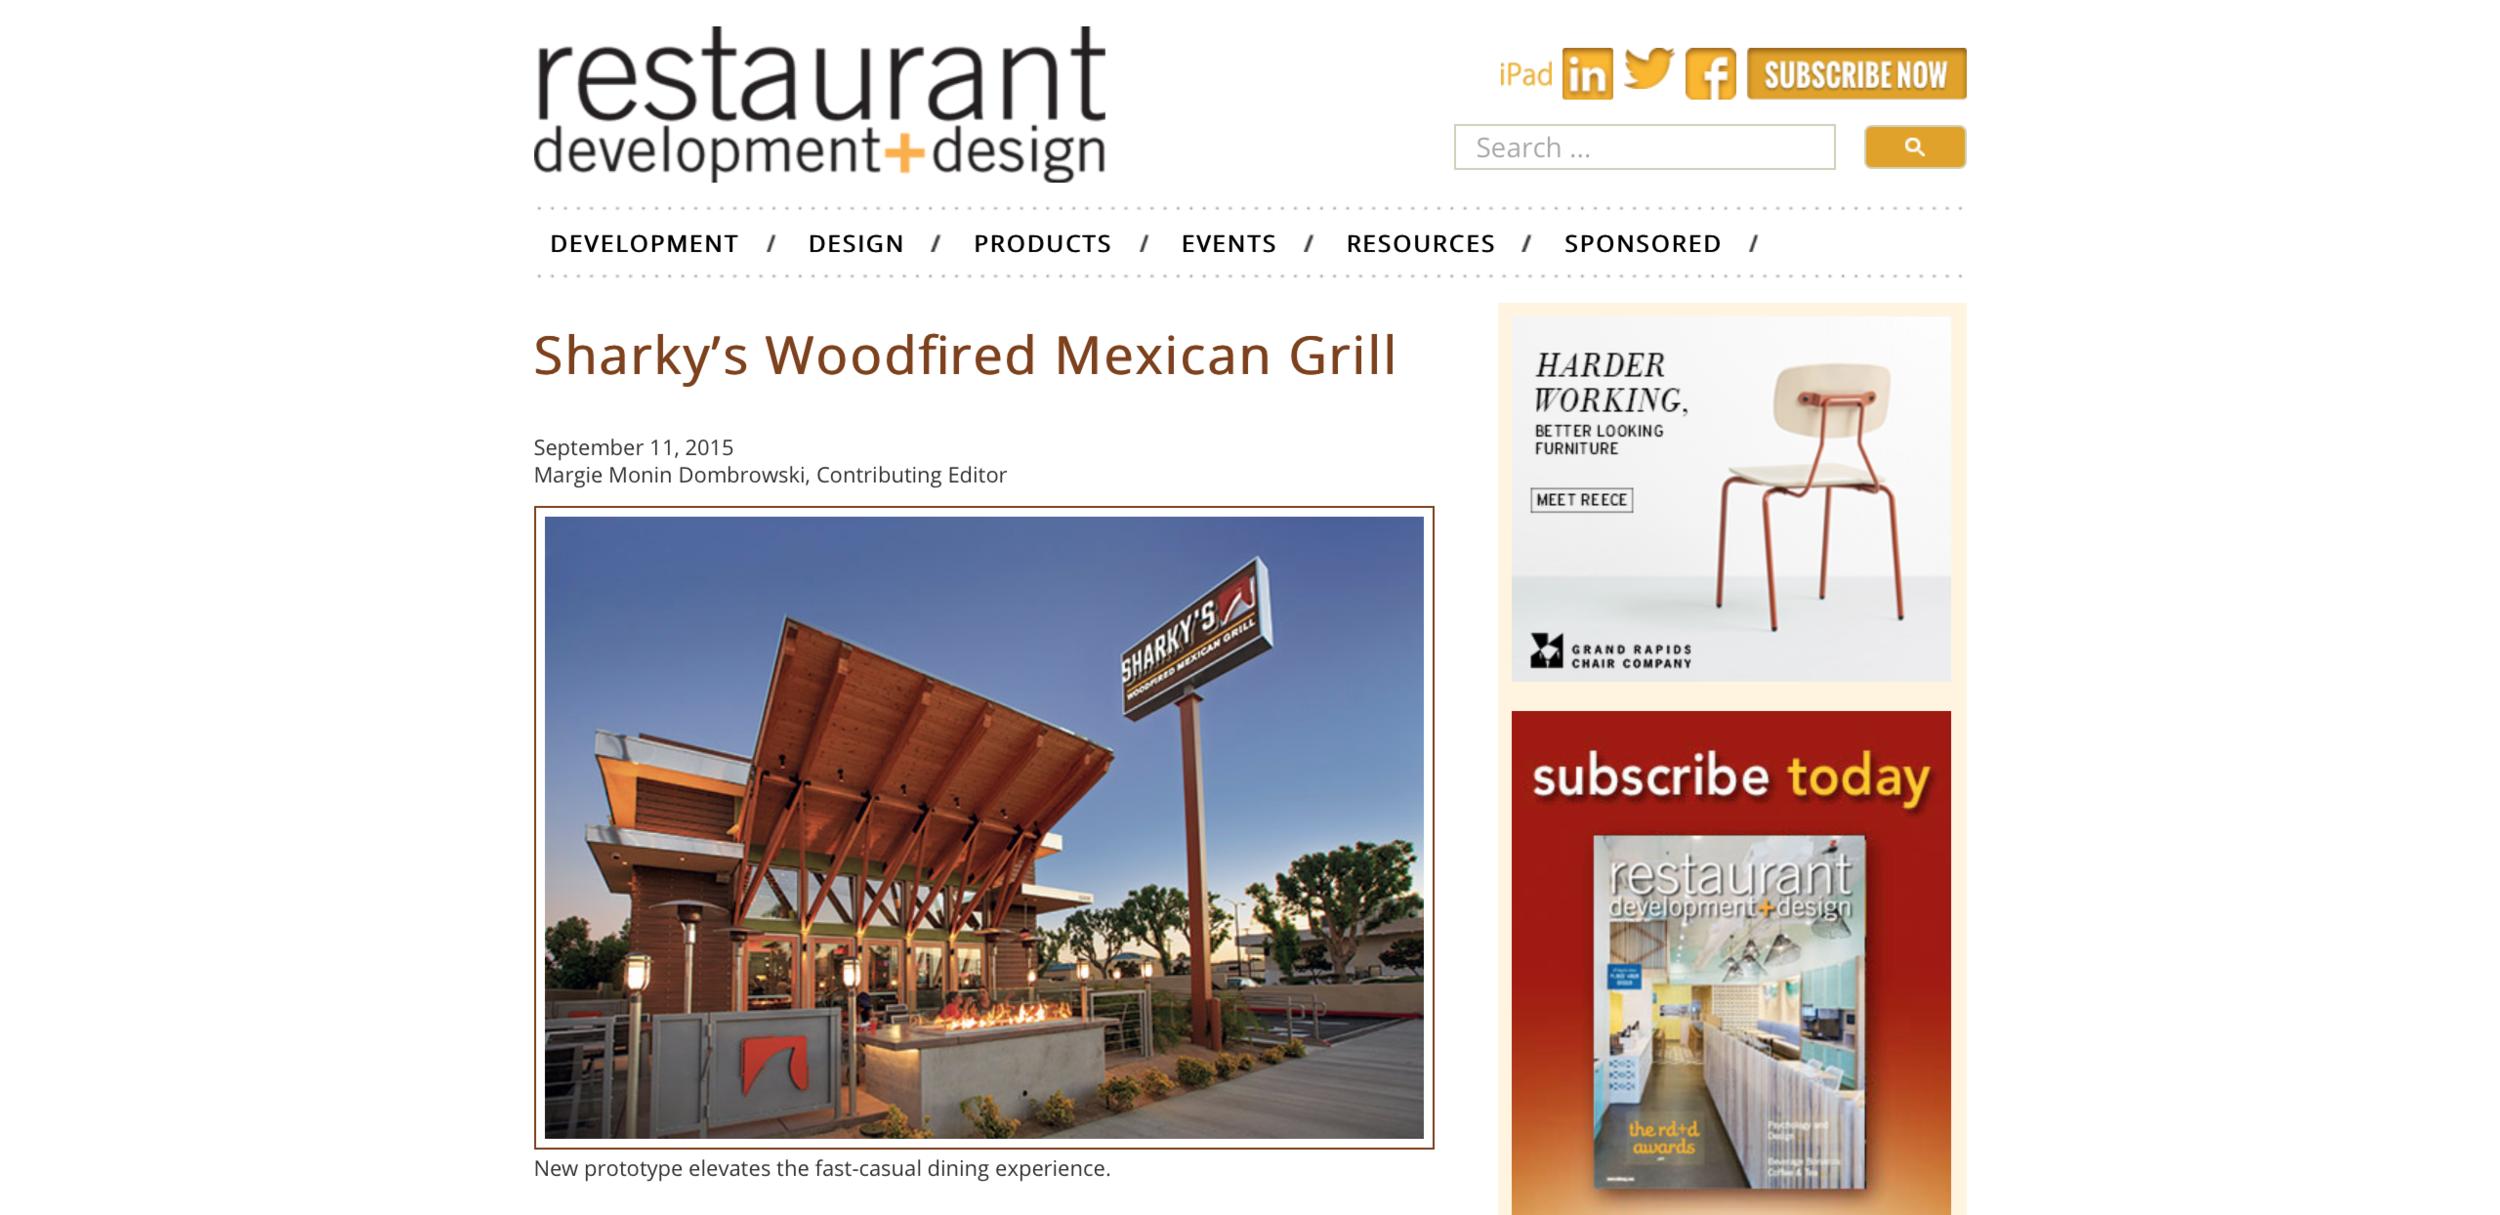 Restaurant Development + Design - Sharkys